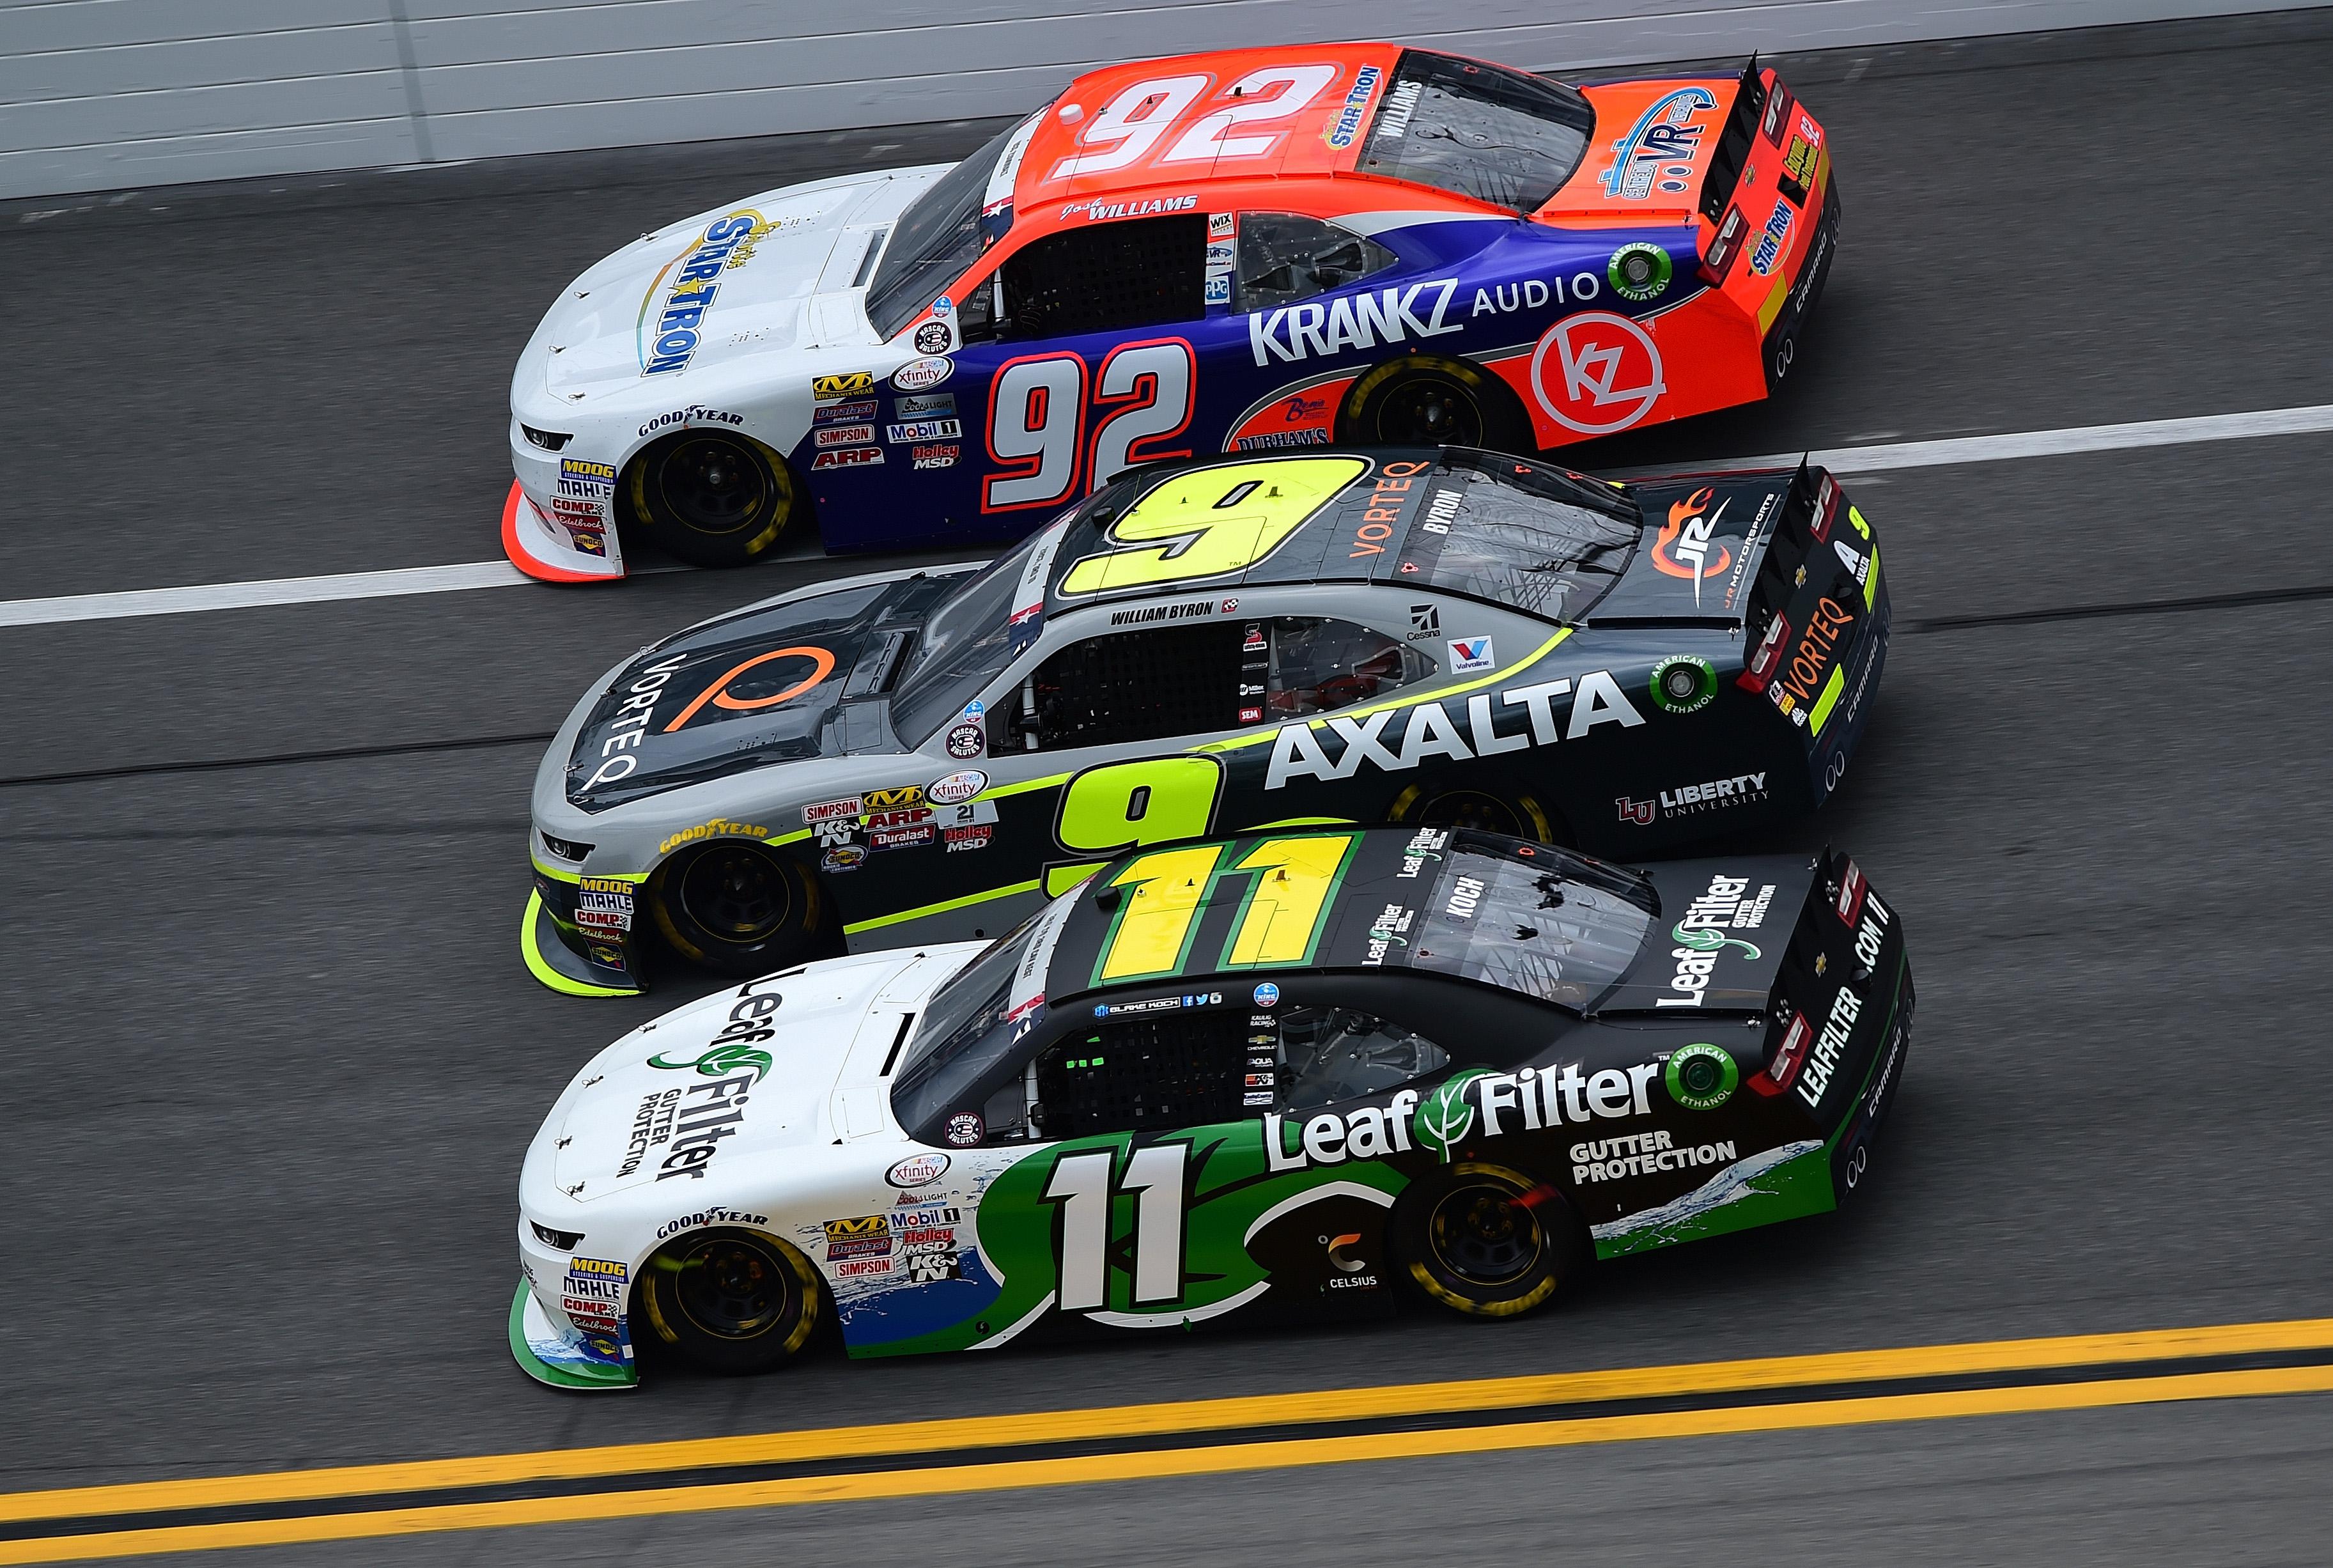 Dale Earnhardt Jr Nascar Xfinity Series Team Profits Racing News